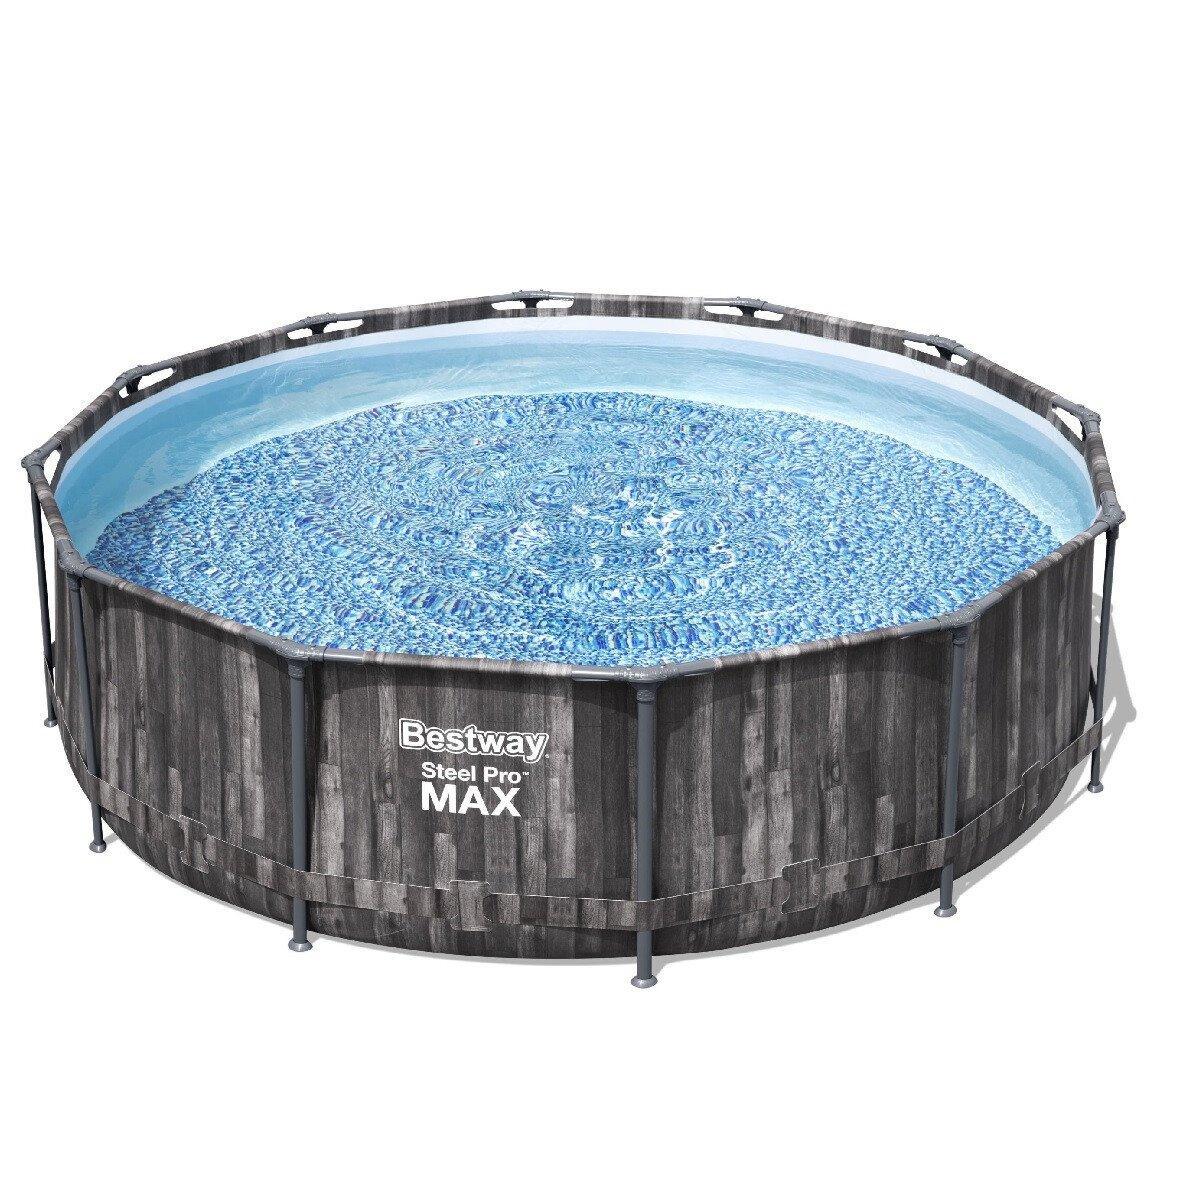 Каркасный бассейн Bestway Wood Style 5614Z (427х107), Каркасные бассейны, Круглая, 427х107, Китай